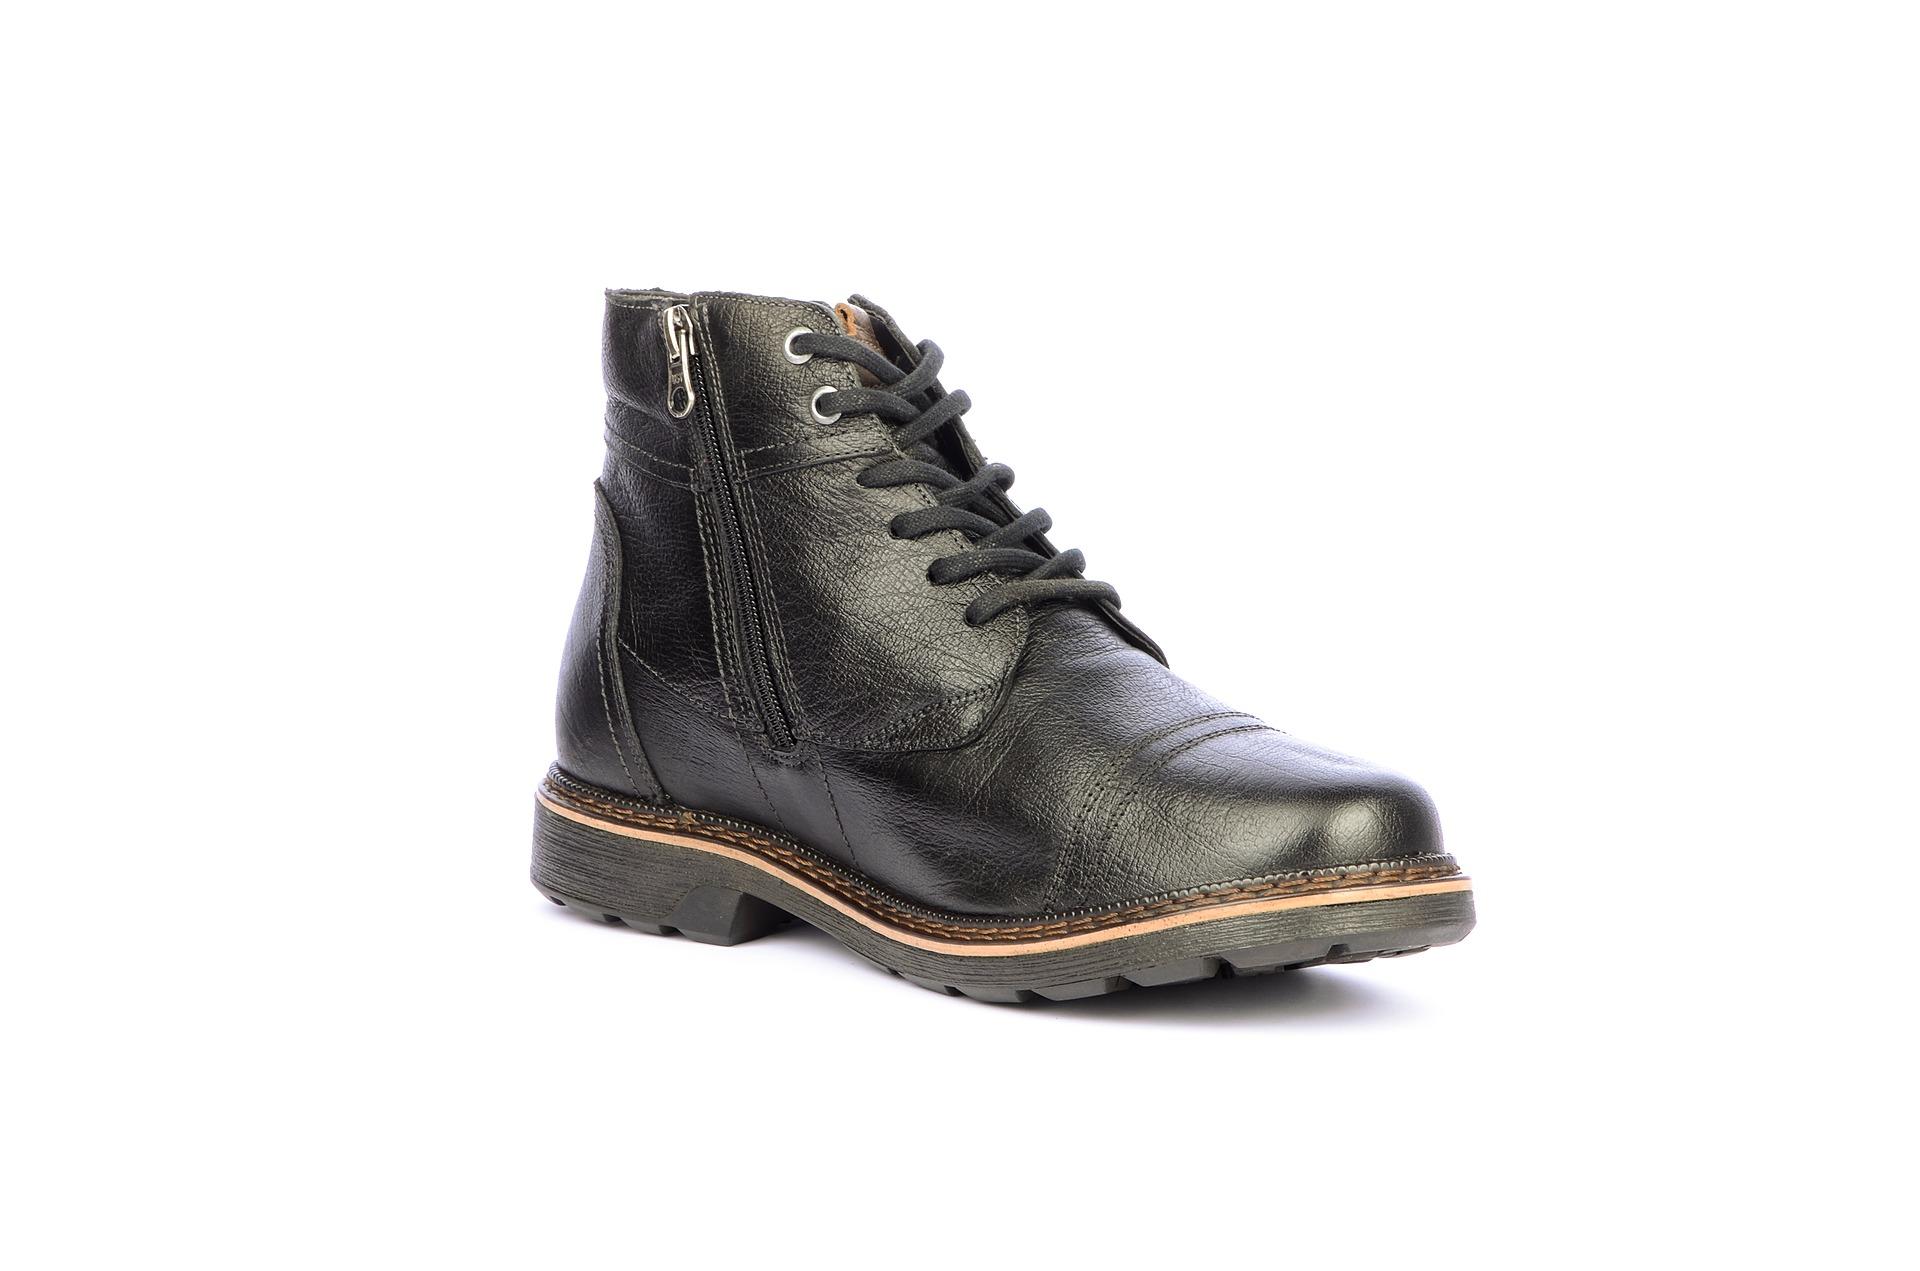 Outlander Negro +7cms